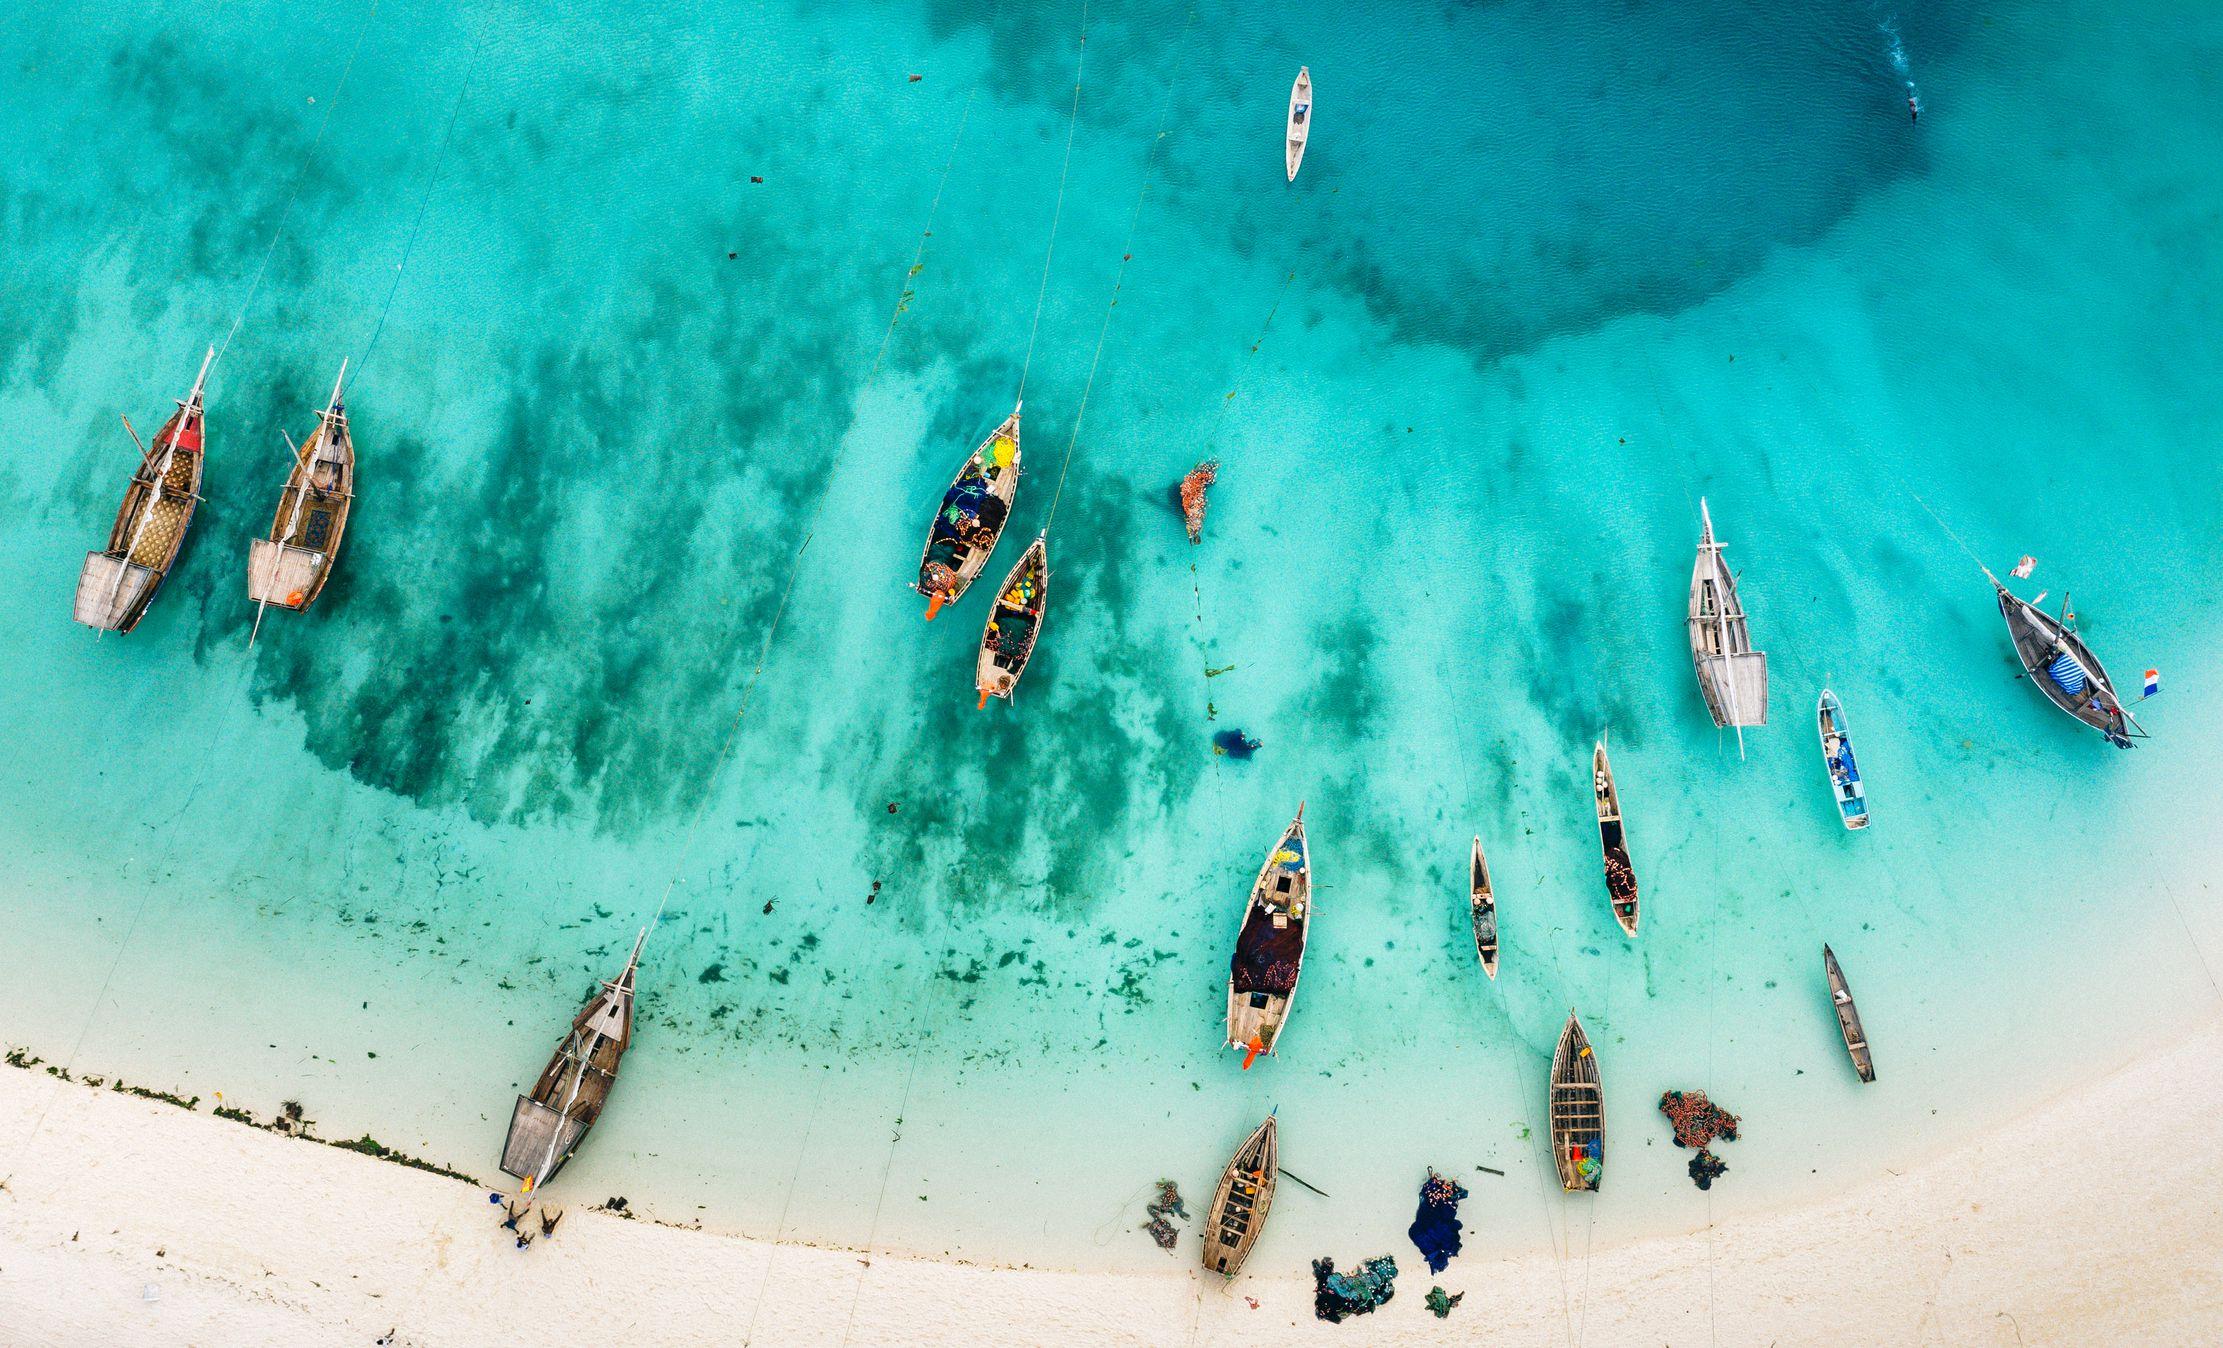 10 Top Things to Do in Zanzibar